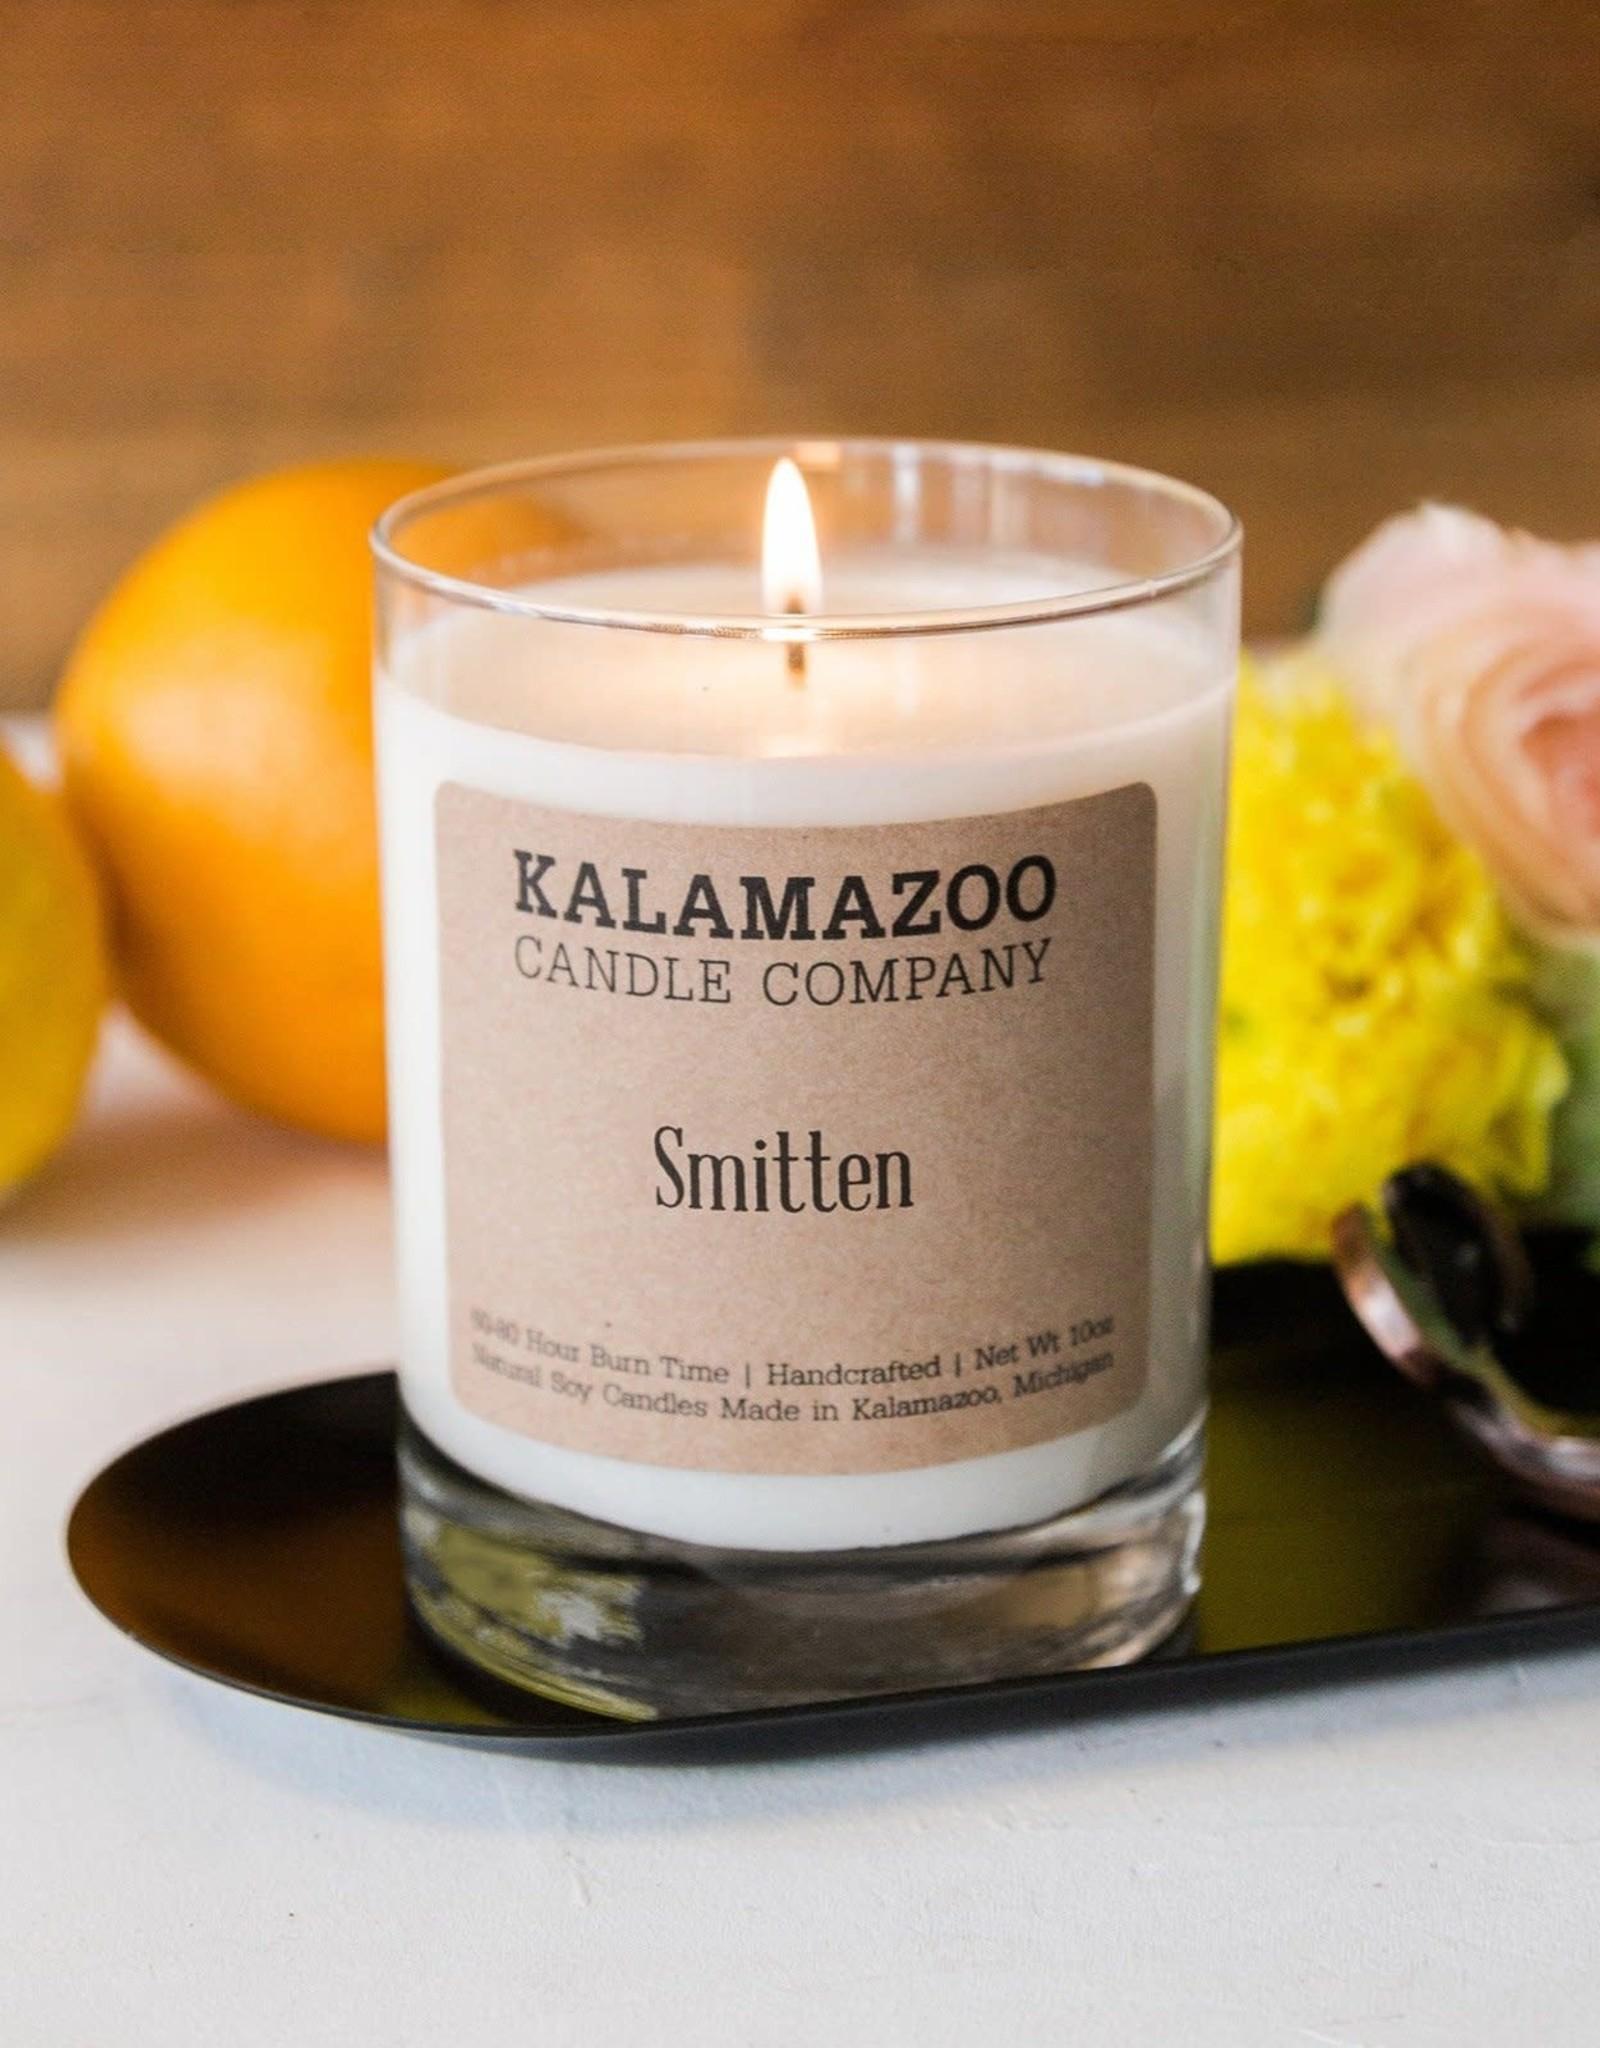 Kalamazoo Candle Co. Kalamazoo Candle Co. | Smitten 10oz Jar